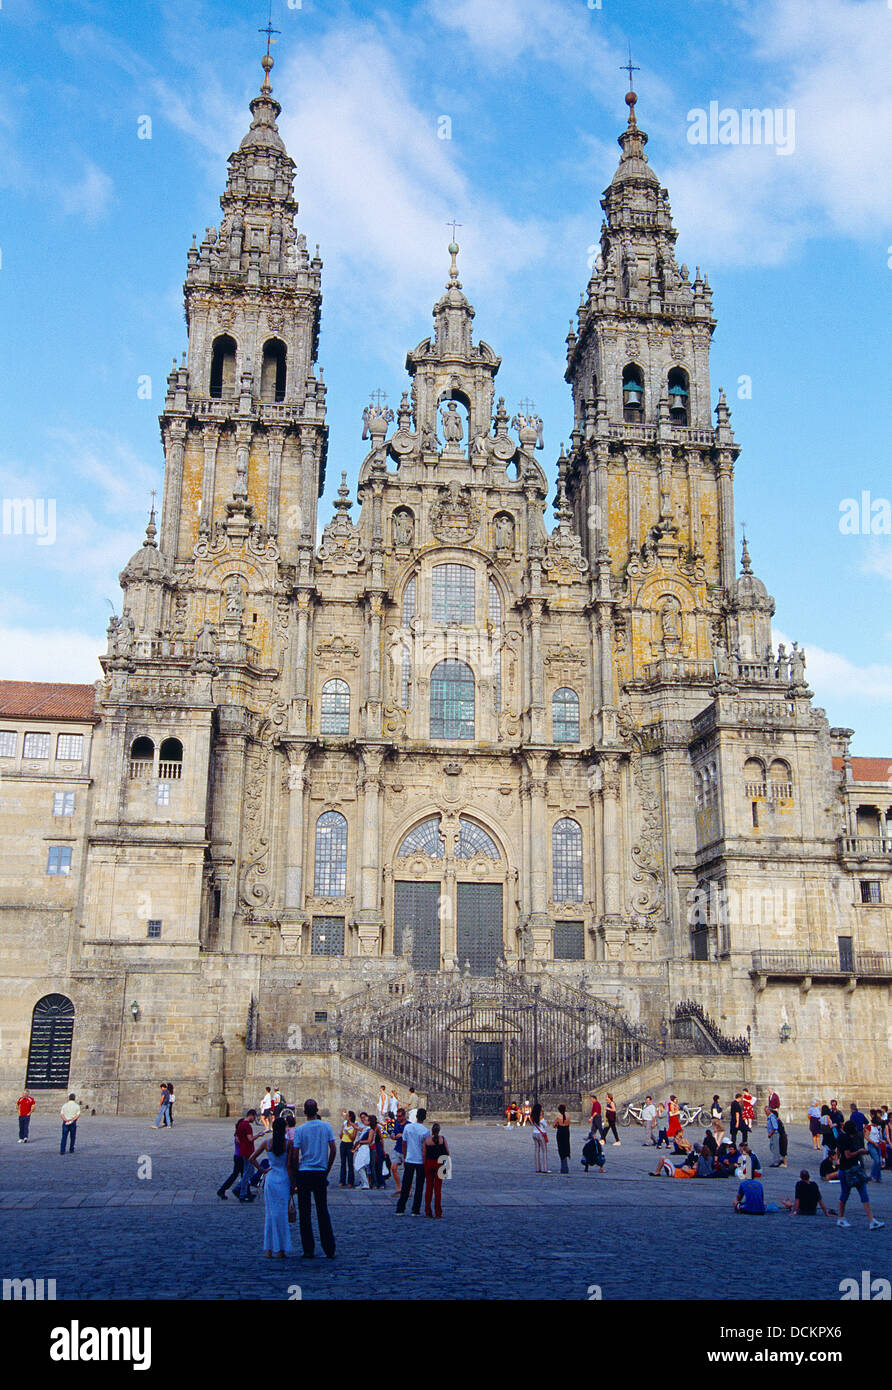 Facade of the cathedral. Obradoiro Square, Santiago de Compostela, La Coruña province, Galicia, Spain. - Stock Image